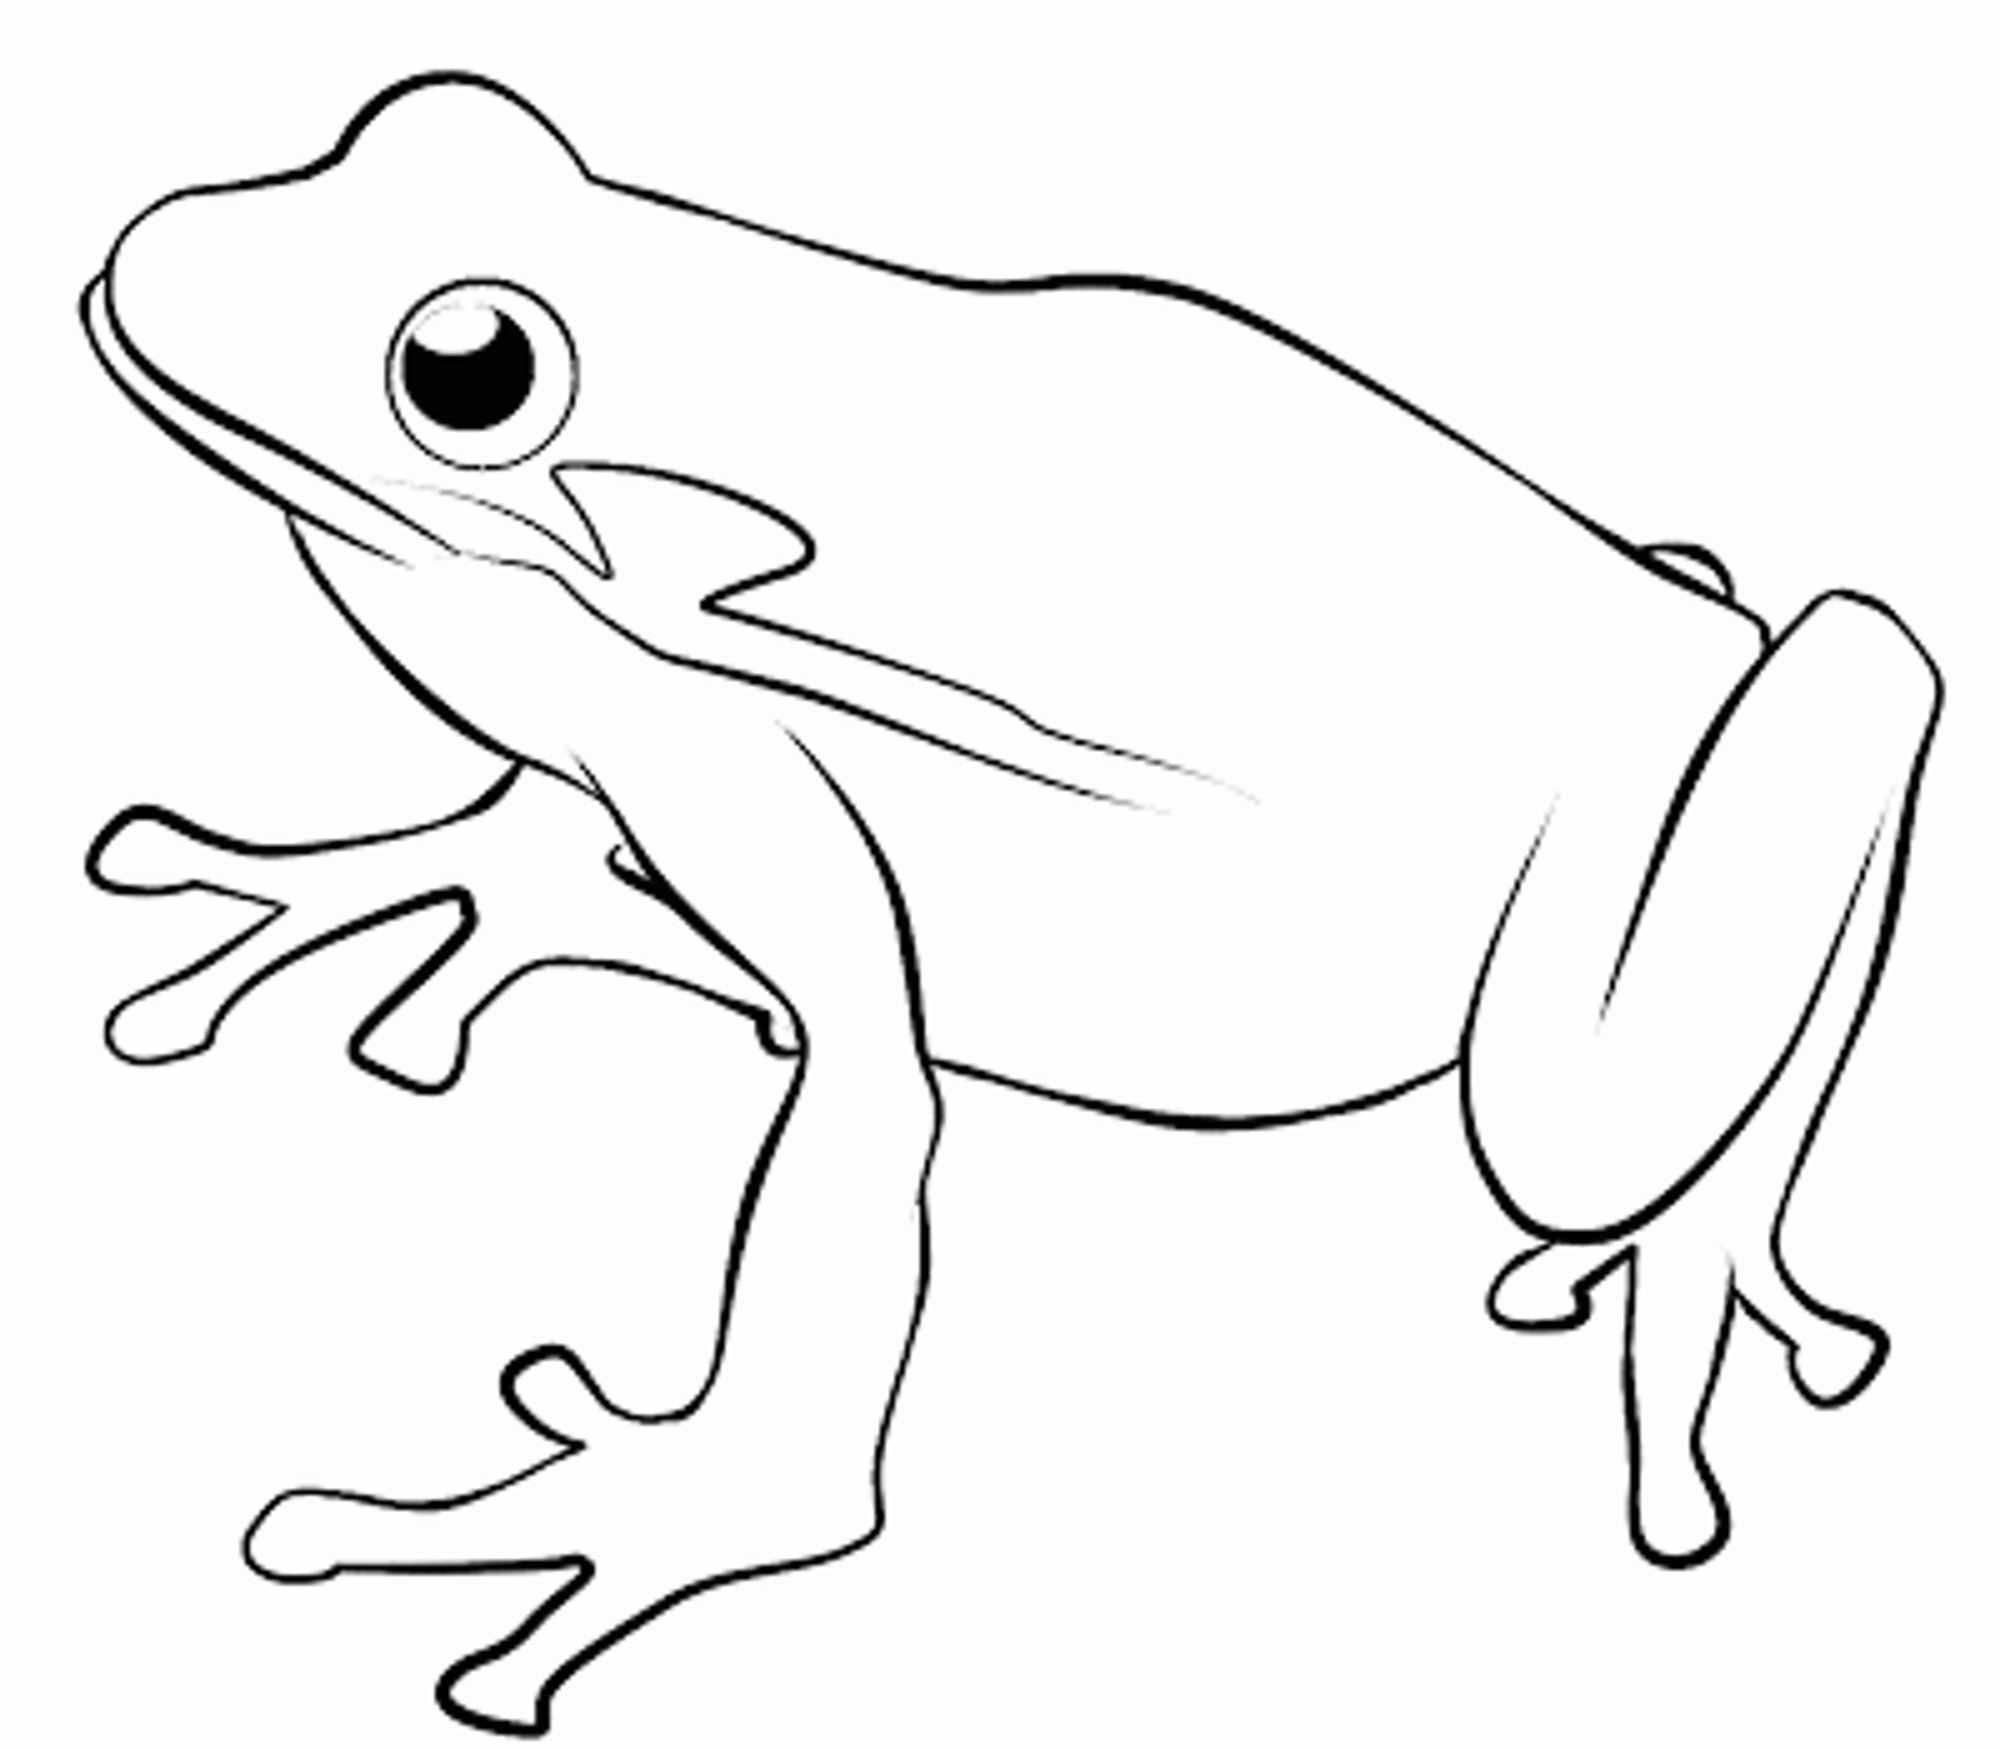 Toad Drawing At Getdrawings